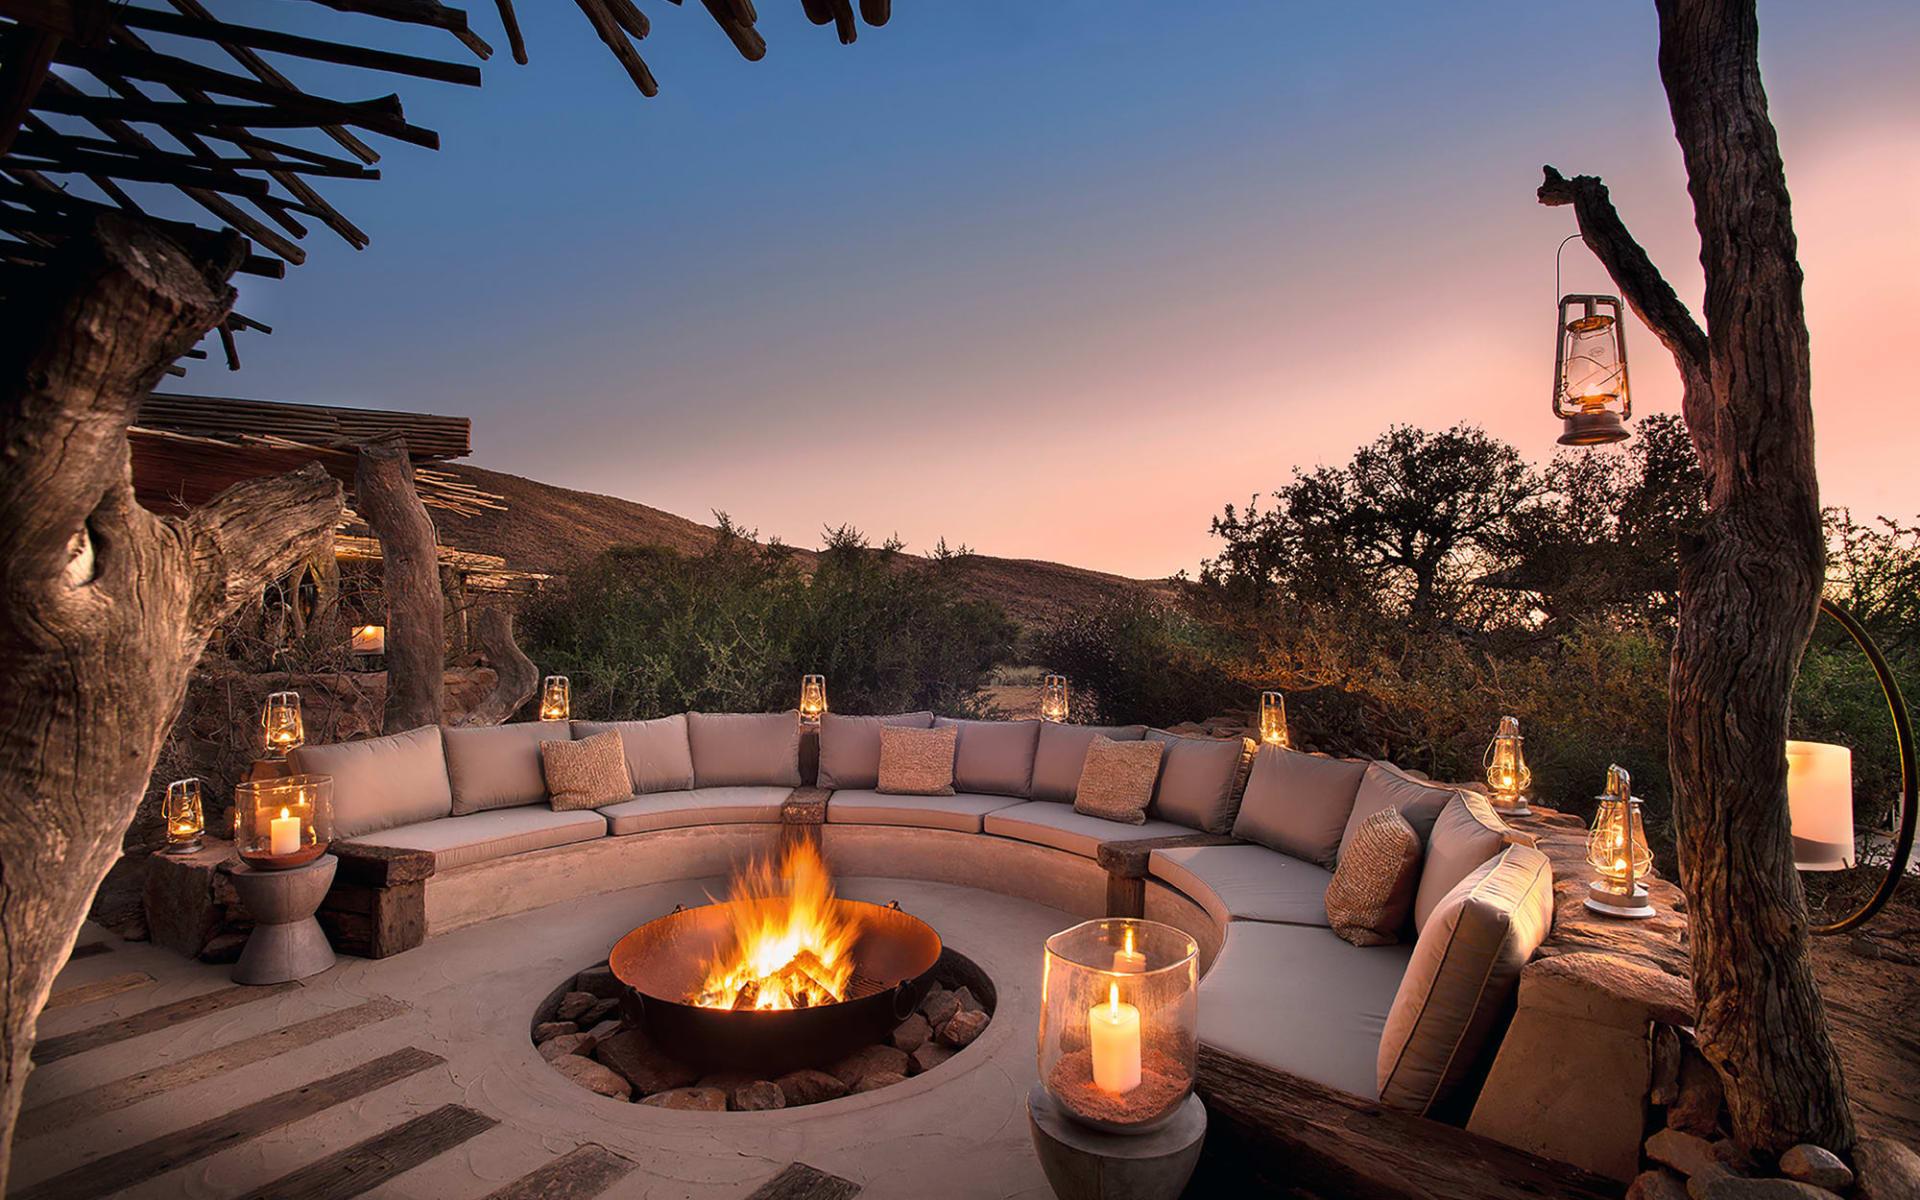 South Africa's Secrets ab Kapstadt: exterior: Tswalu - Feurstelle mit Lounge